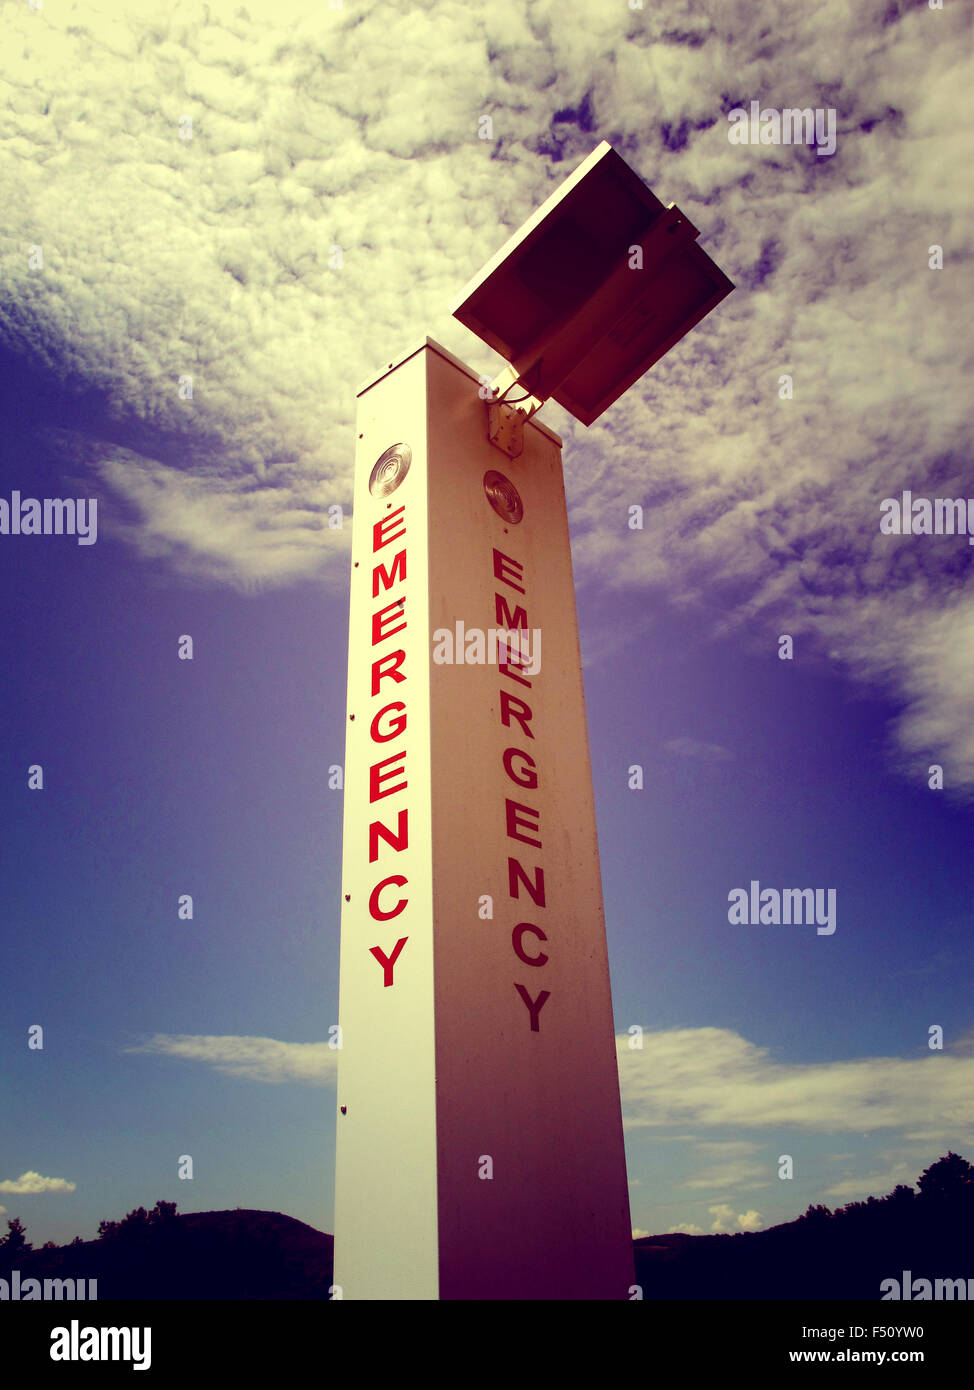 Emergency call box - Stock Image